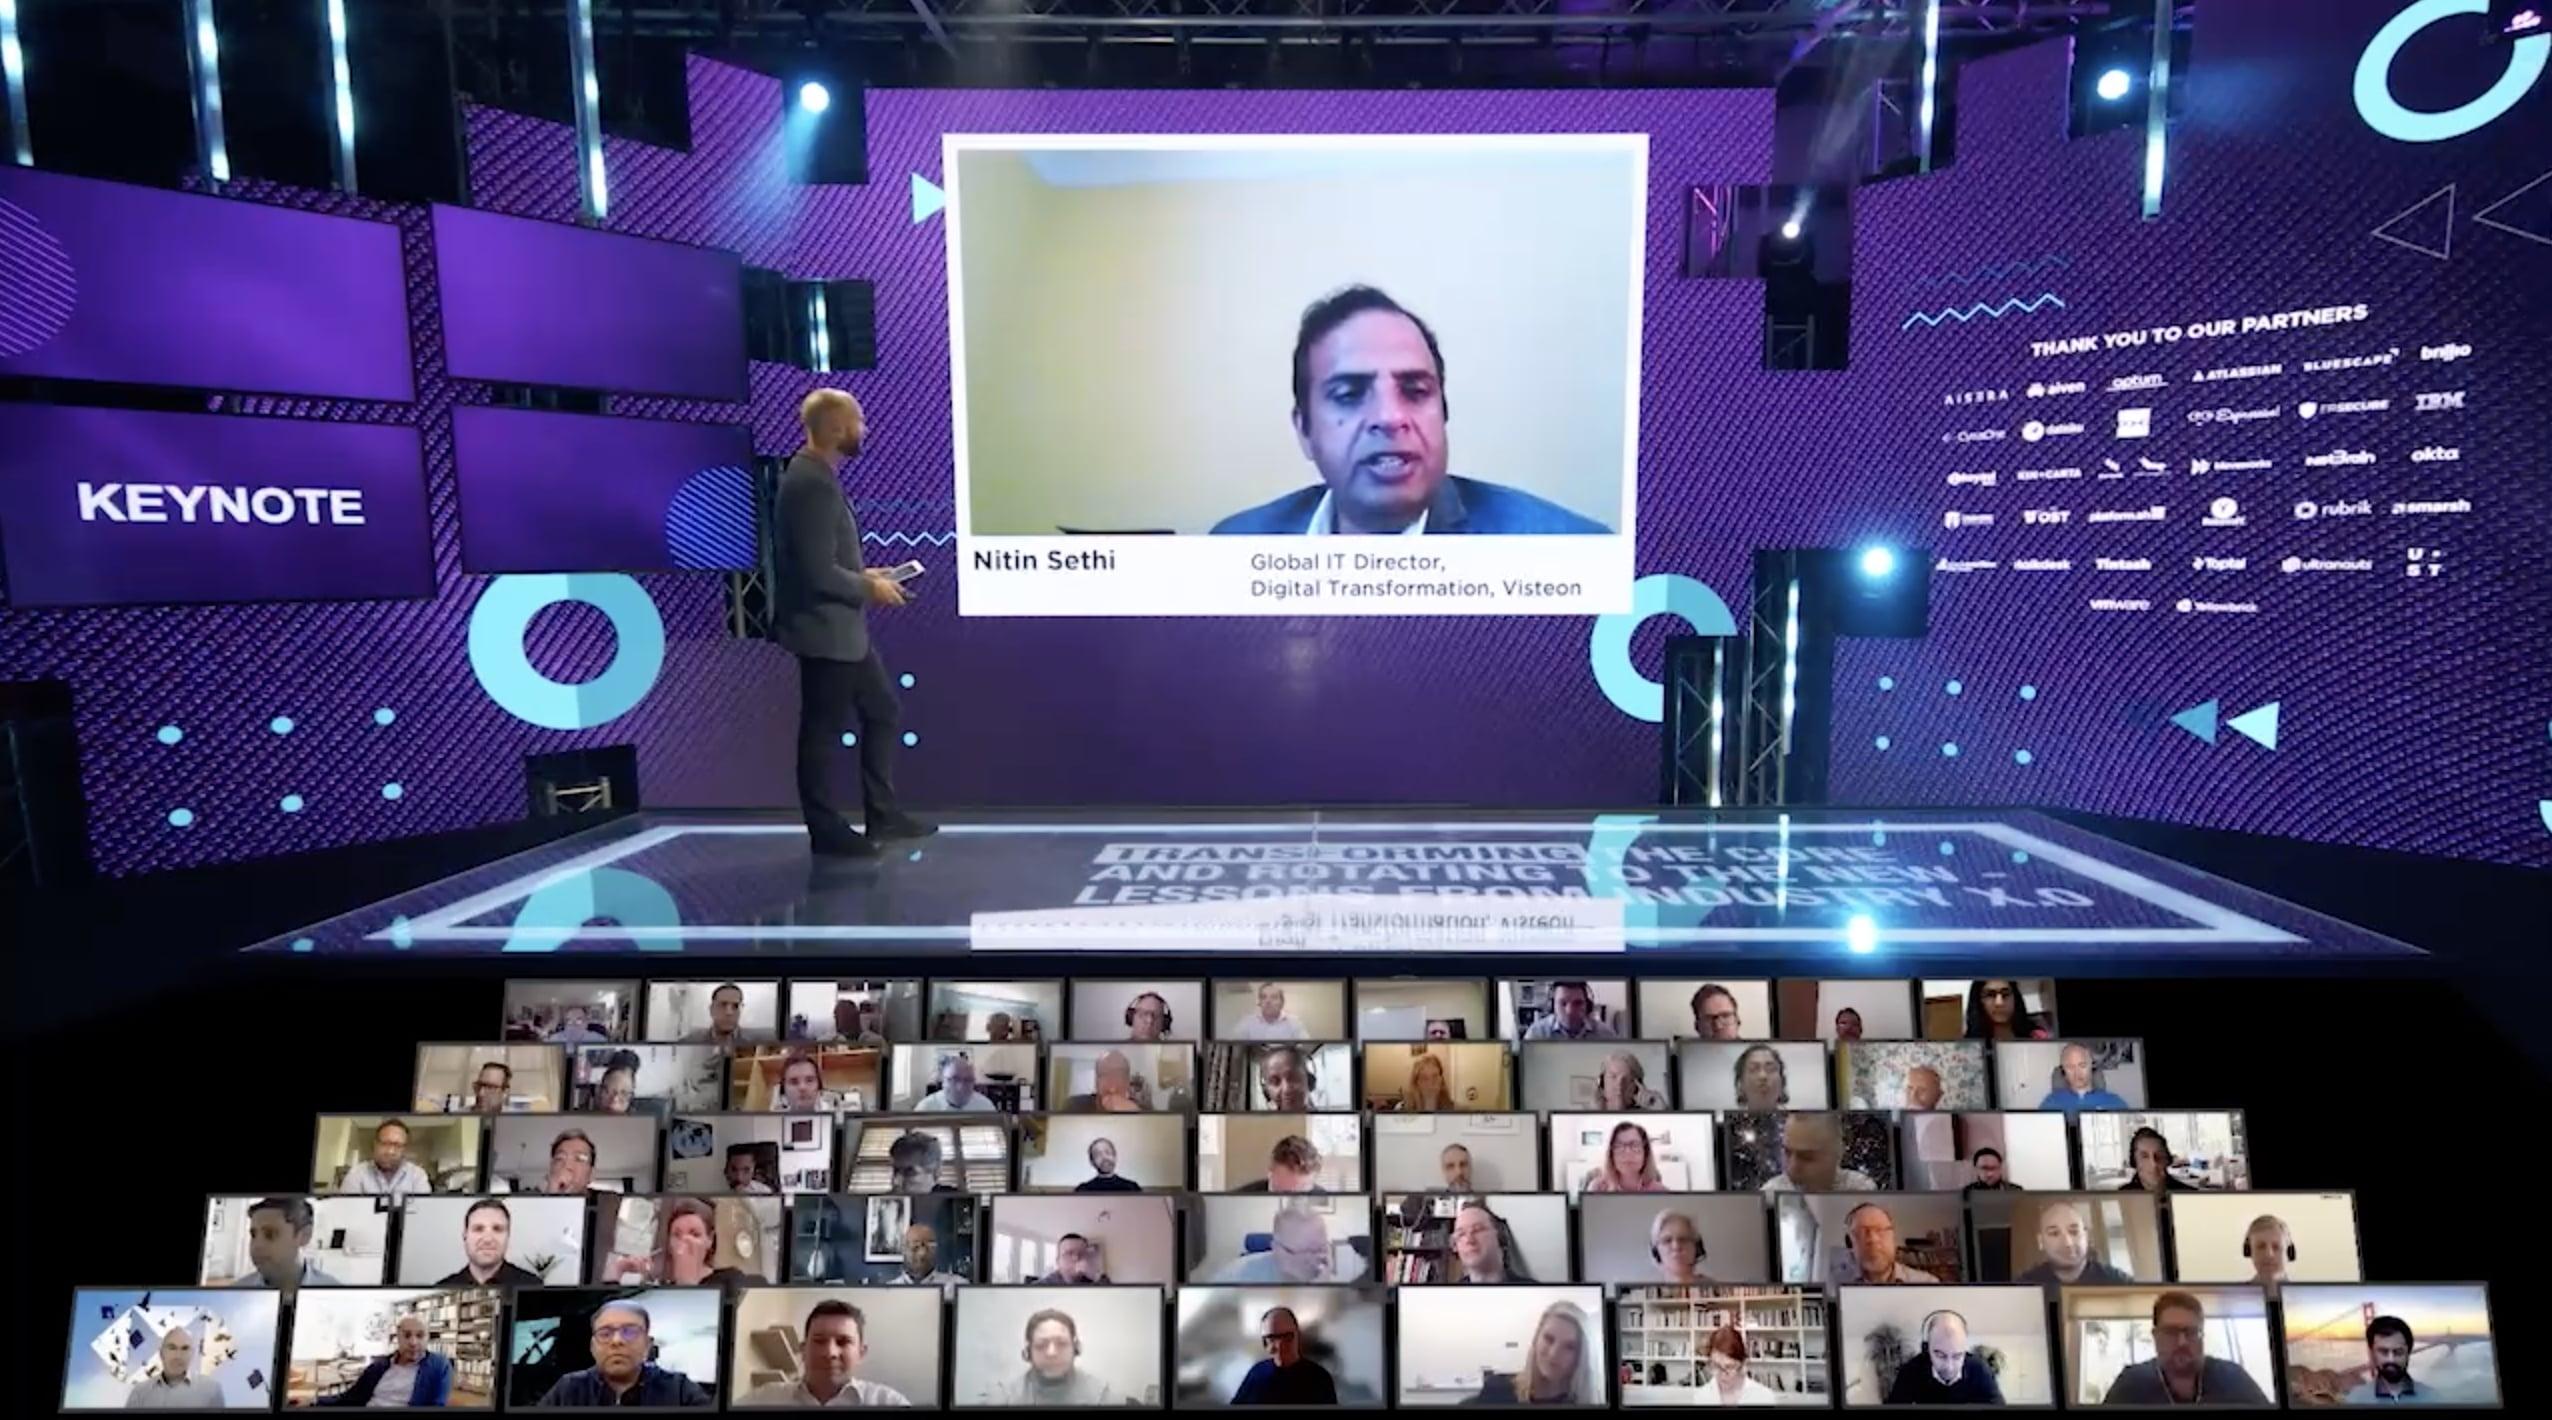 Nithin Sethi, Visteon - The Customer and the role of the CIO